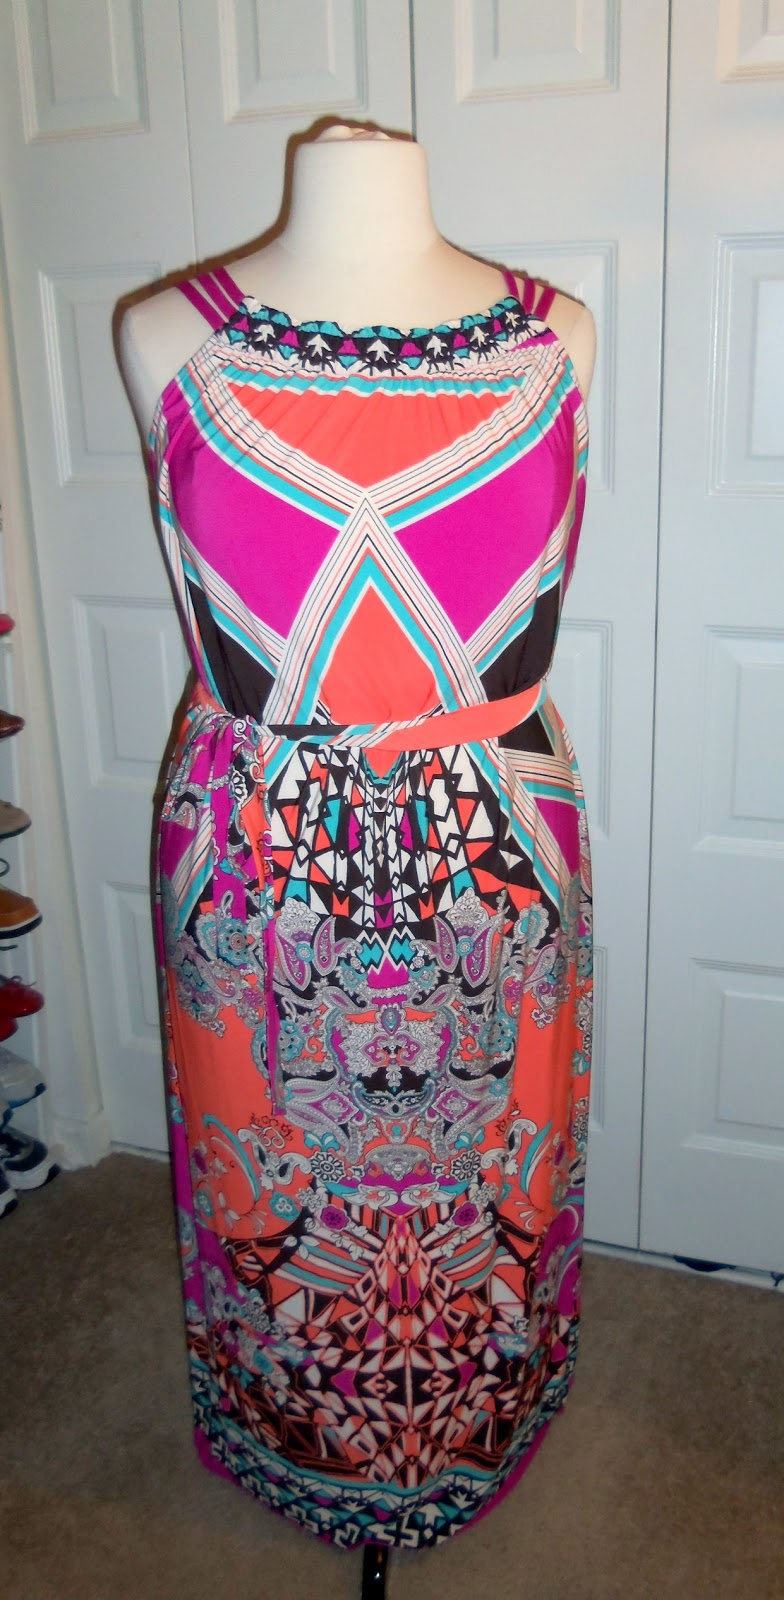 Plus Size Dress for Less – Fashion dresses